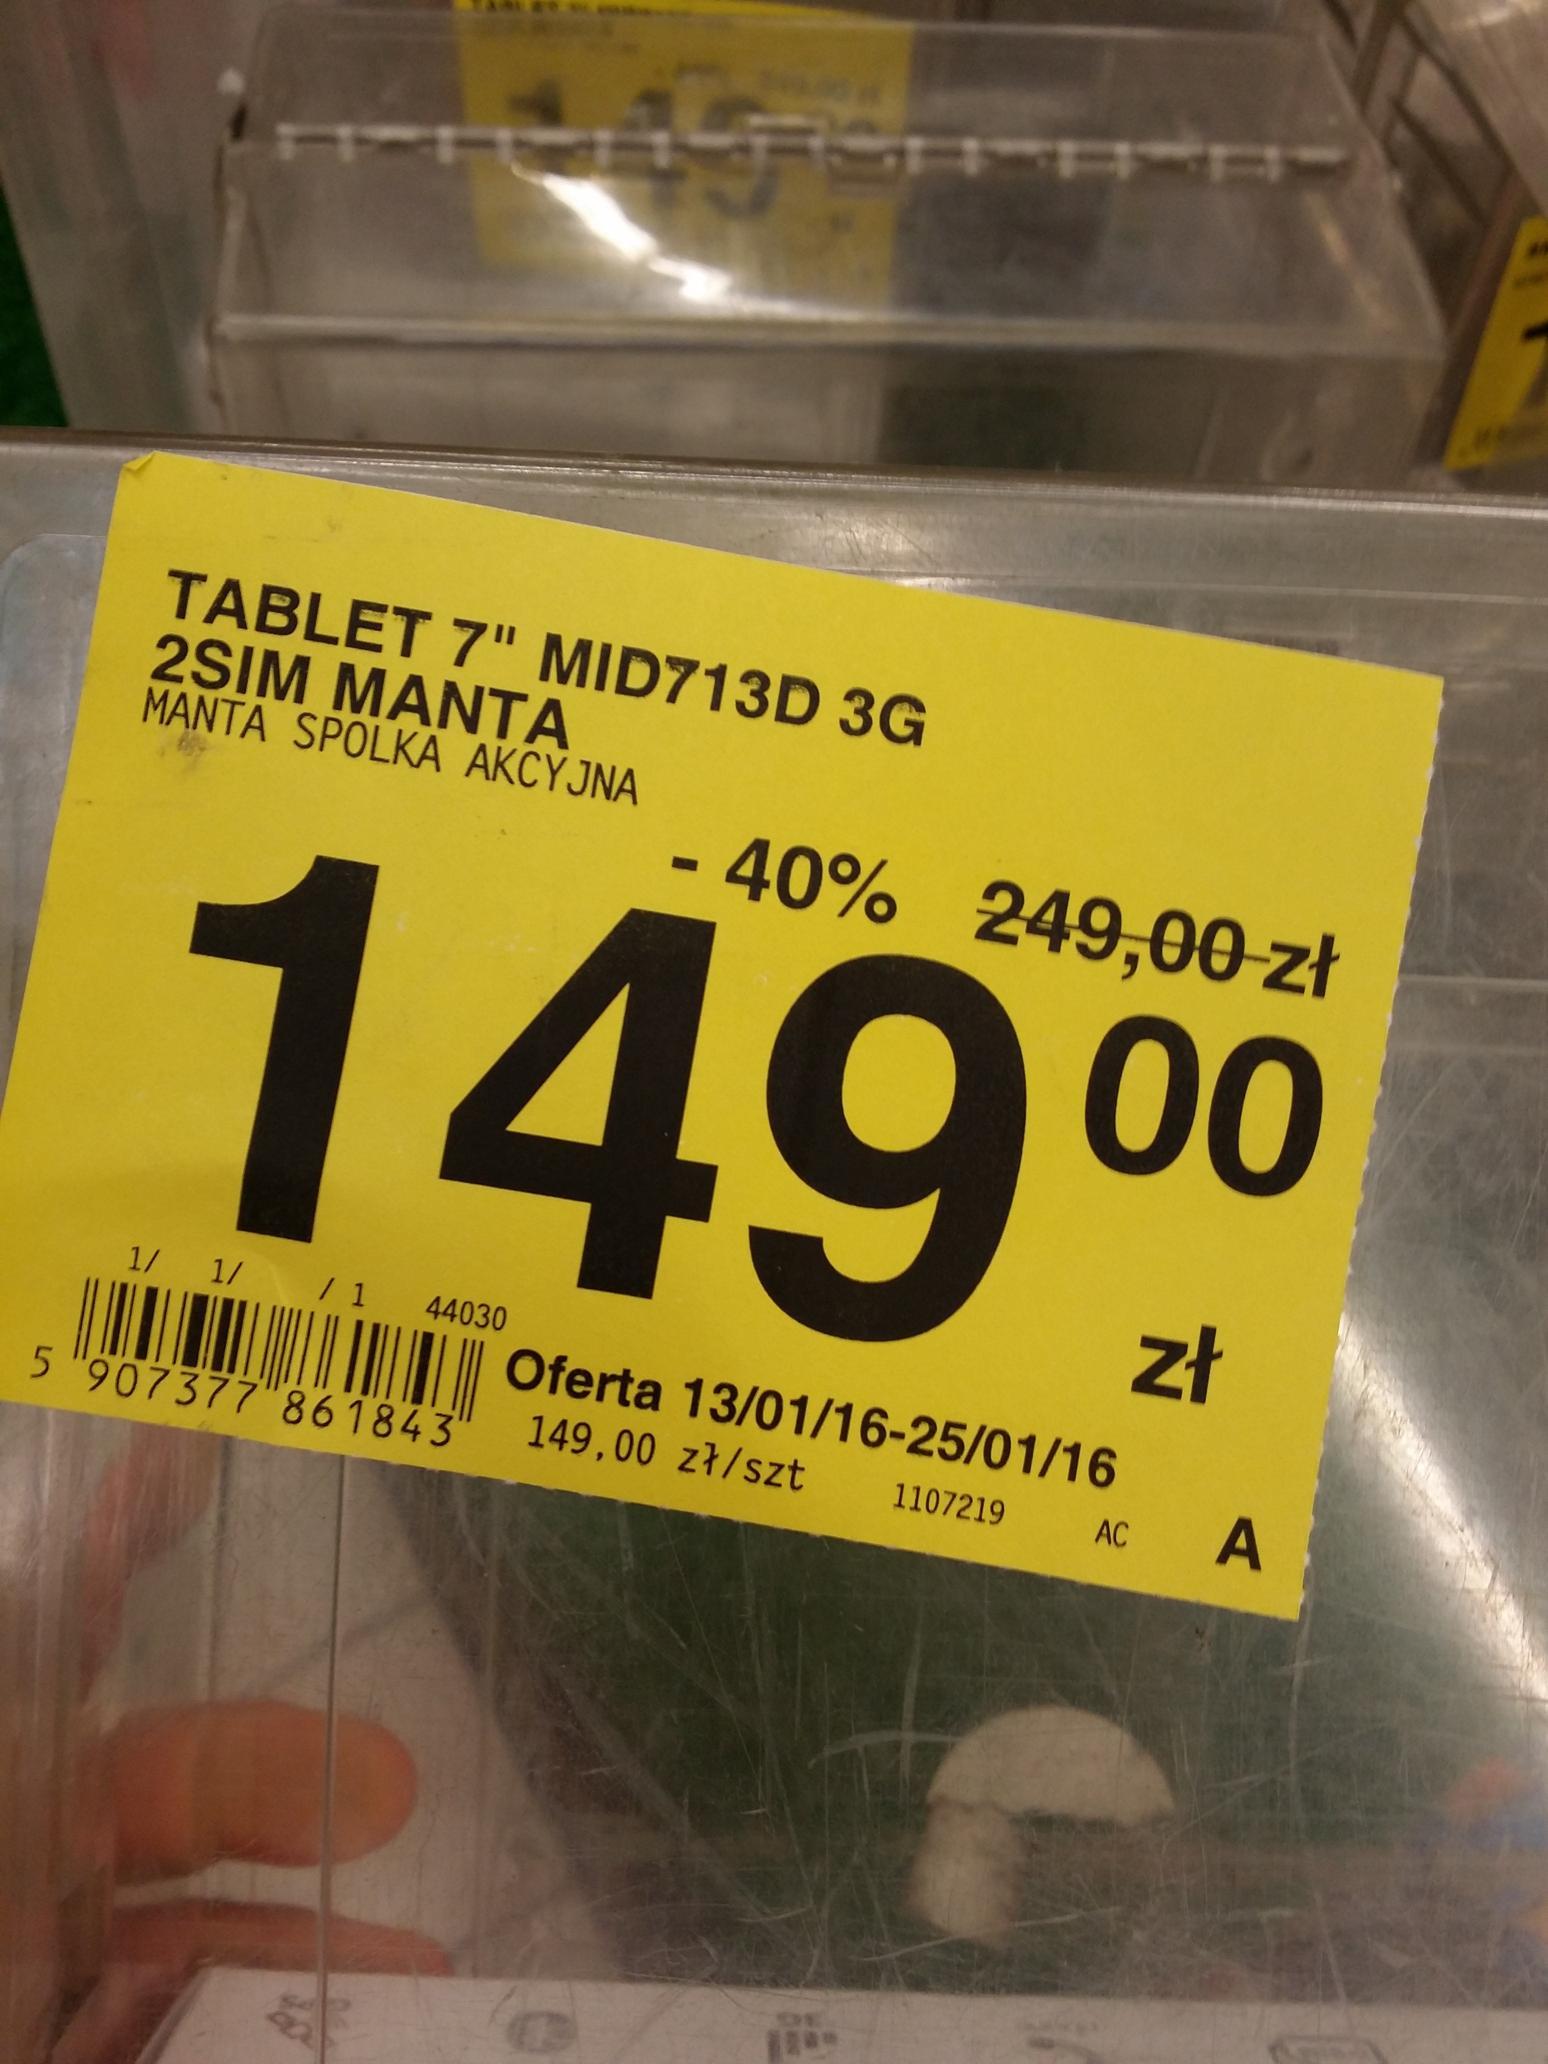 "Tablet 7"" Manta MID713 (Dual SIM, 3G, GPS) @Carrefour"